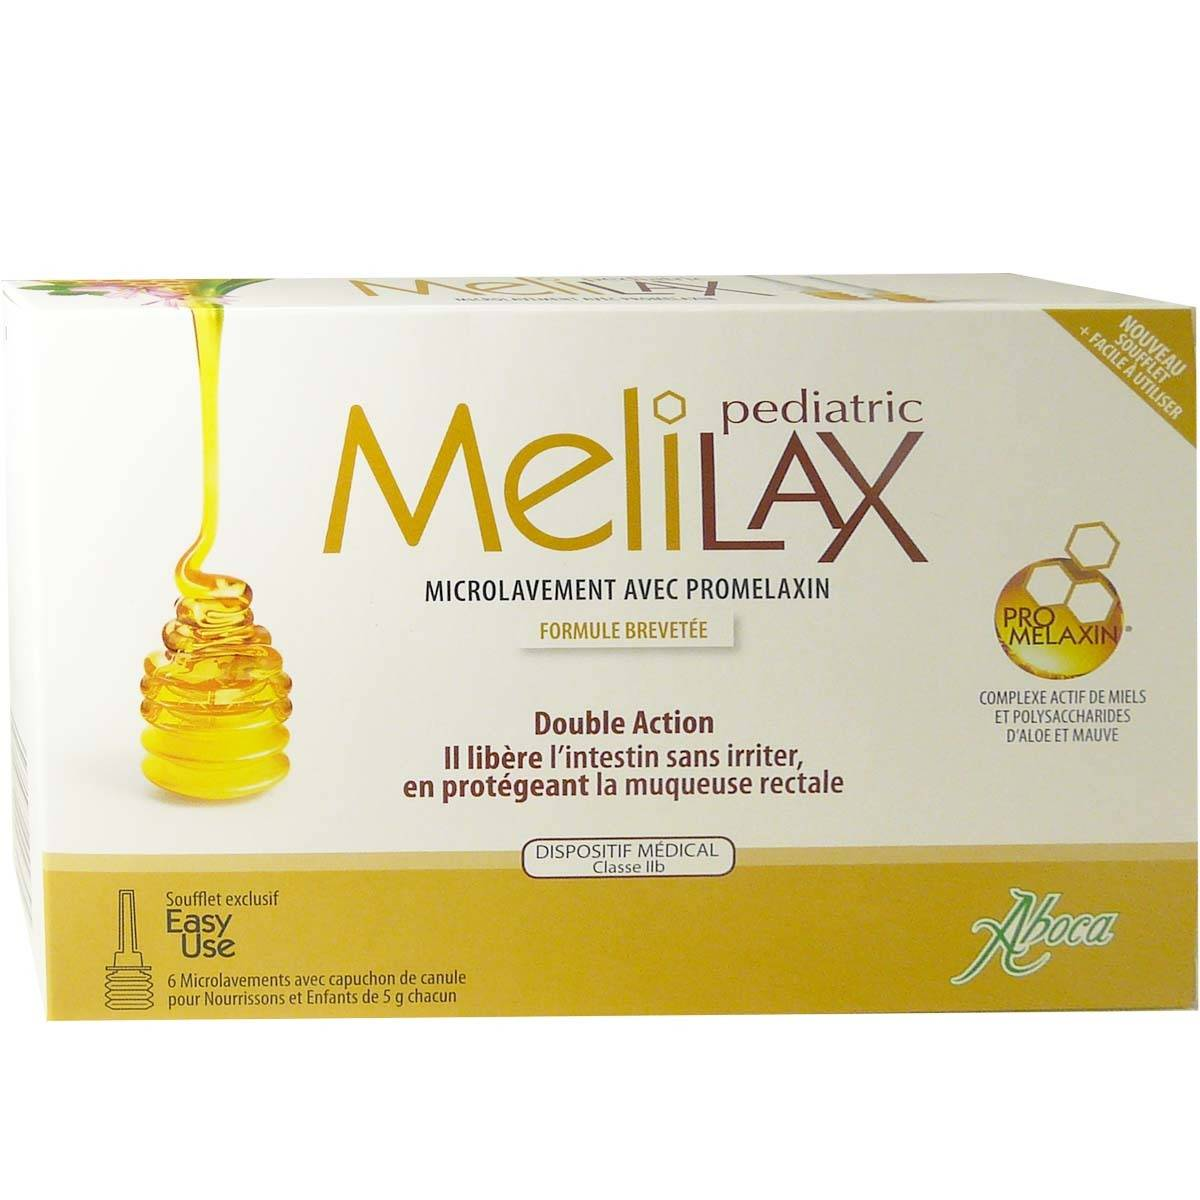 Aboca melilax pediatric microlavement avec promelaxin 6 dosettes